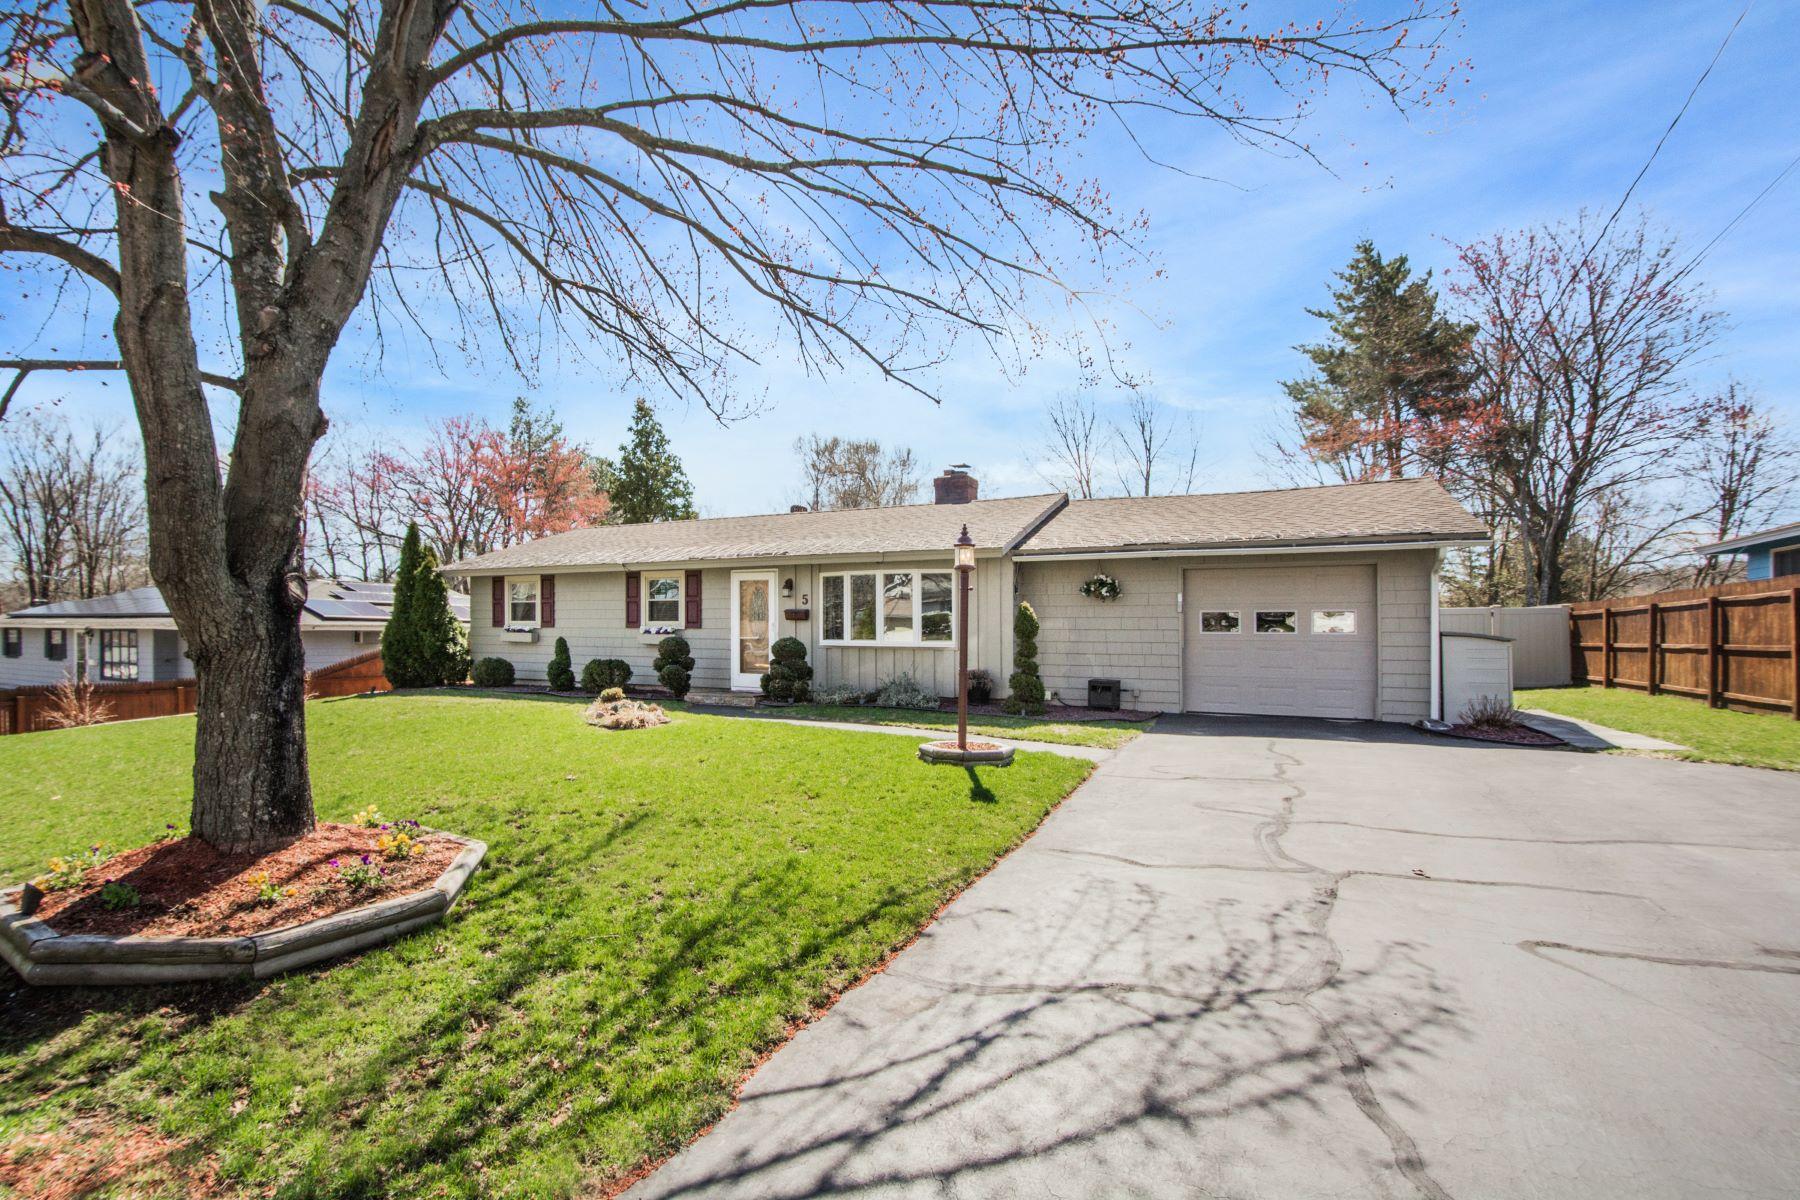 Single Family Home for Active at 5 Wickford Rd Framingham, Massachusetts 01701 United States